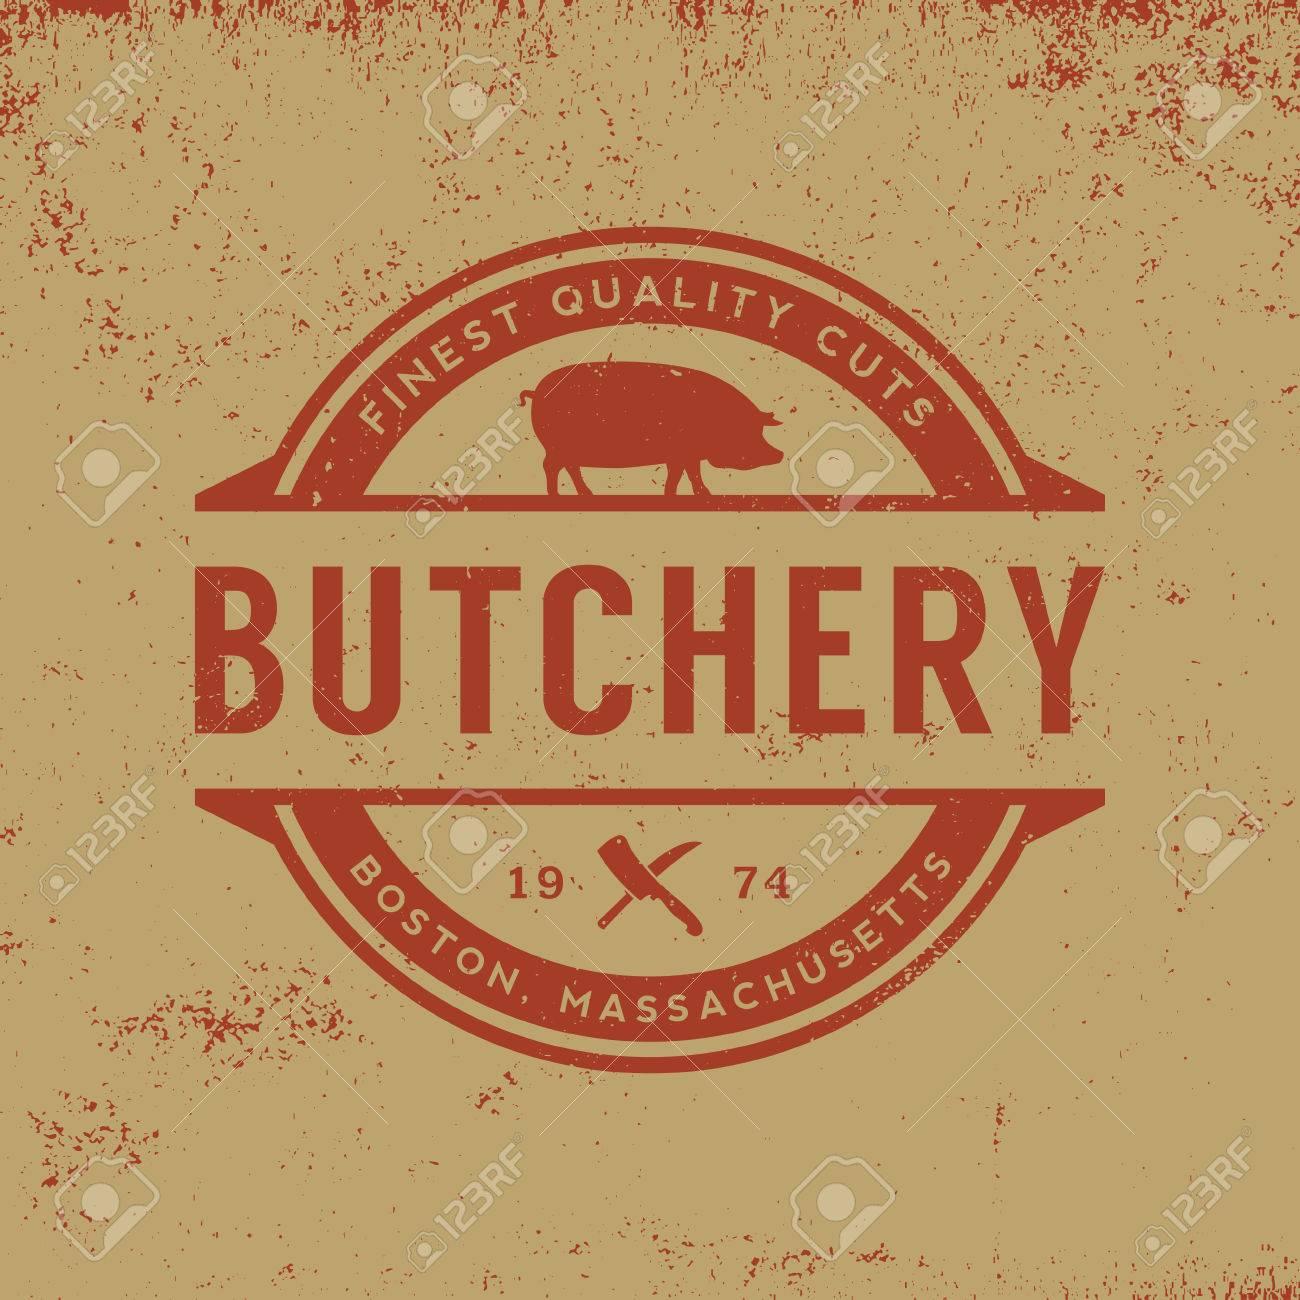 butchery label on grunge background - 42864170